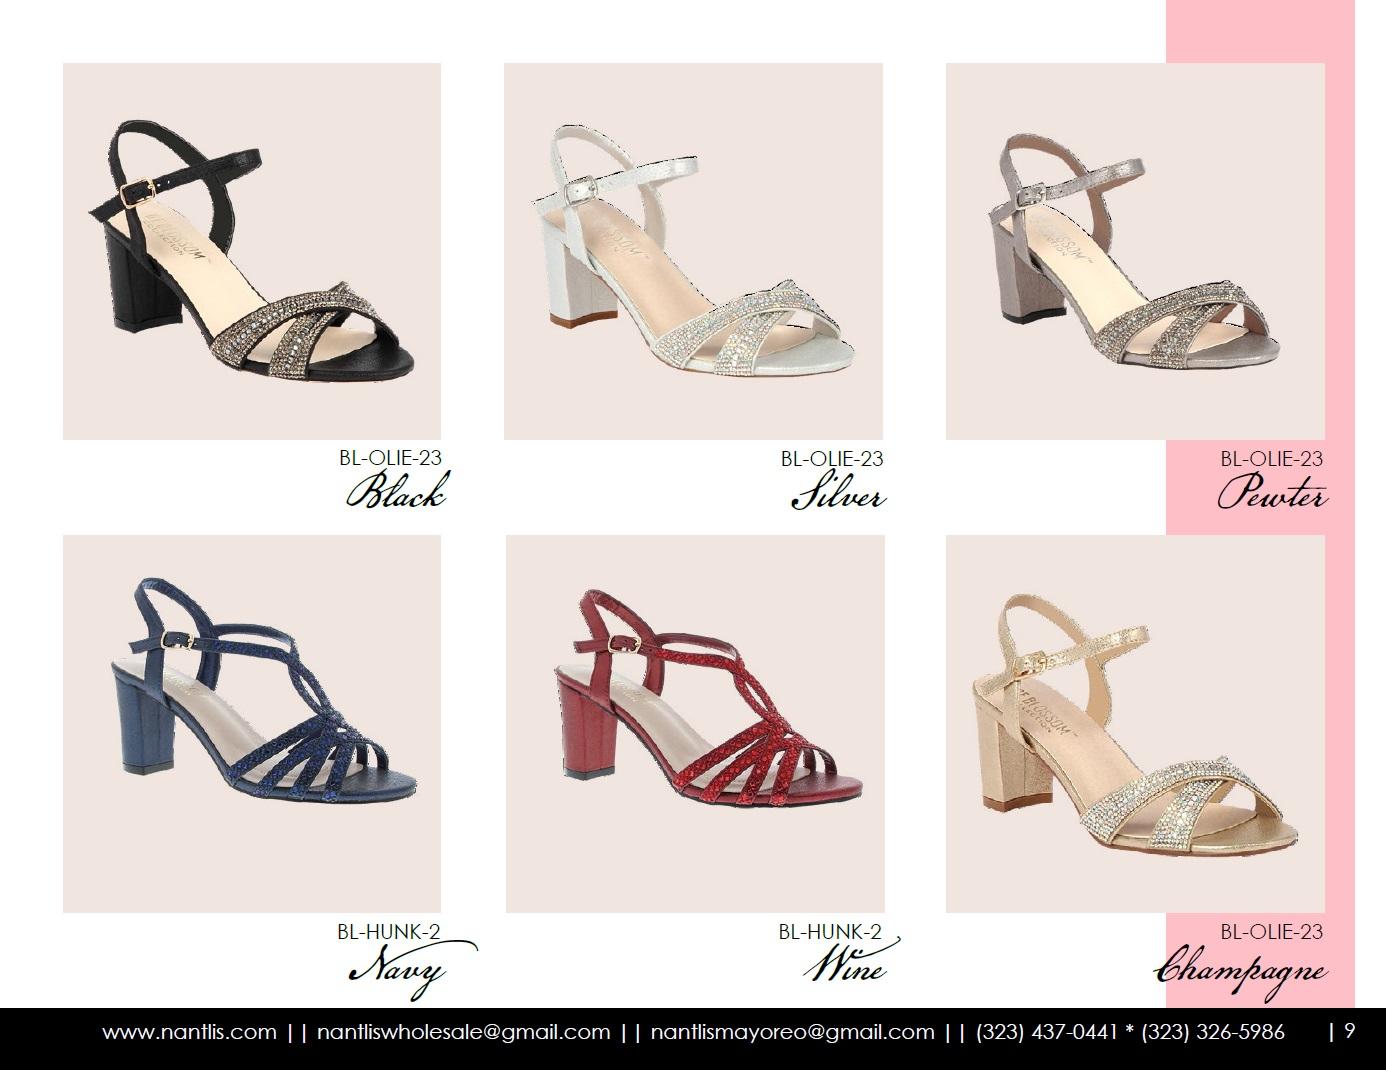 Nantlis Vol BL50 Zapatos de Mujer mayoreo Catalogo Wholesale womens Shoes_Page_09